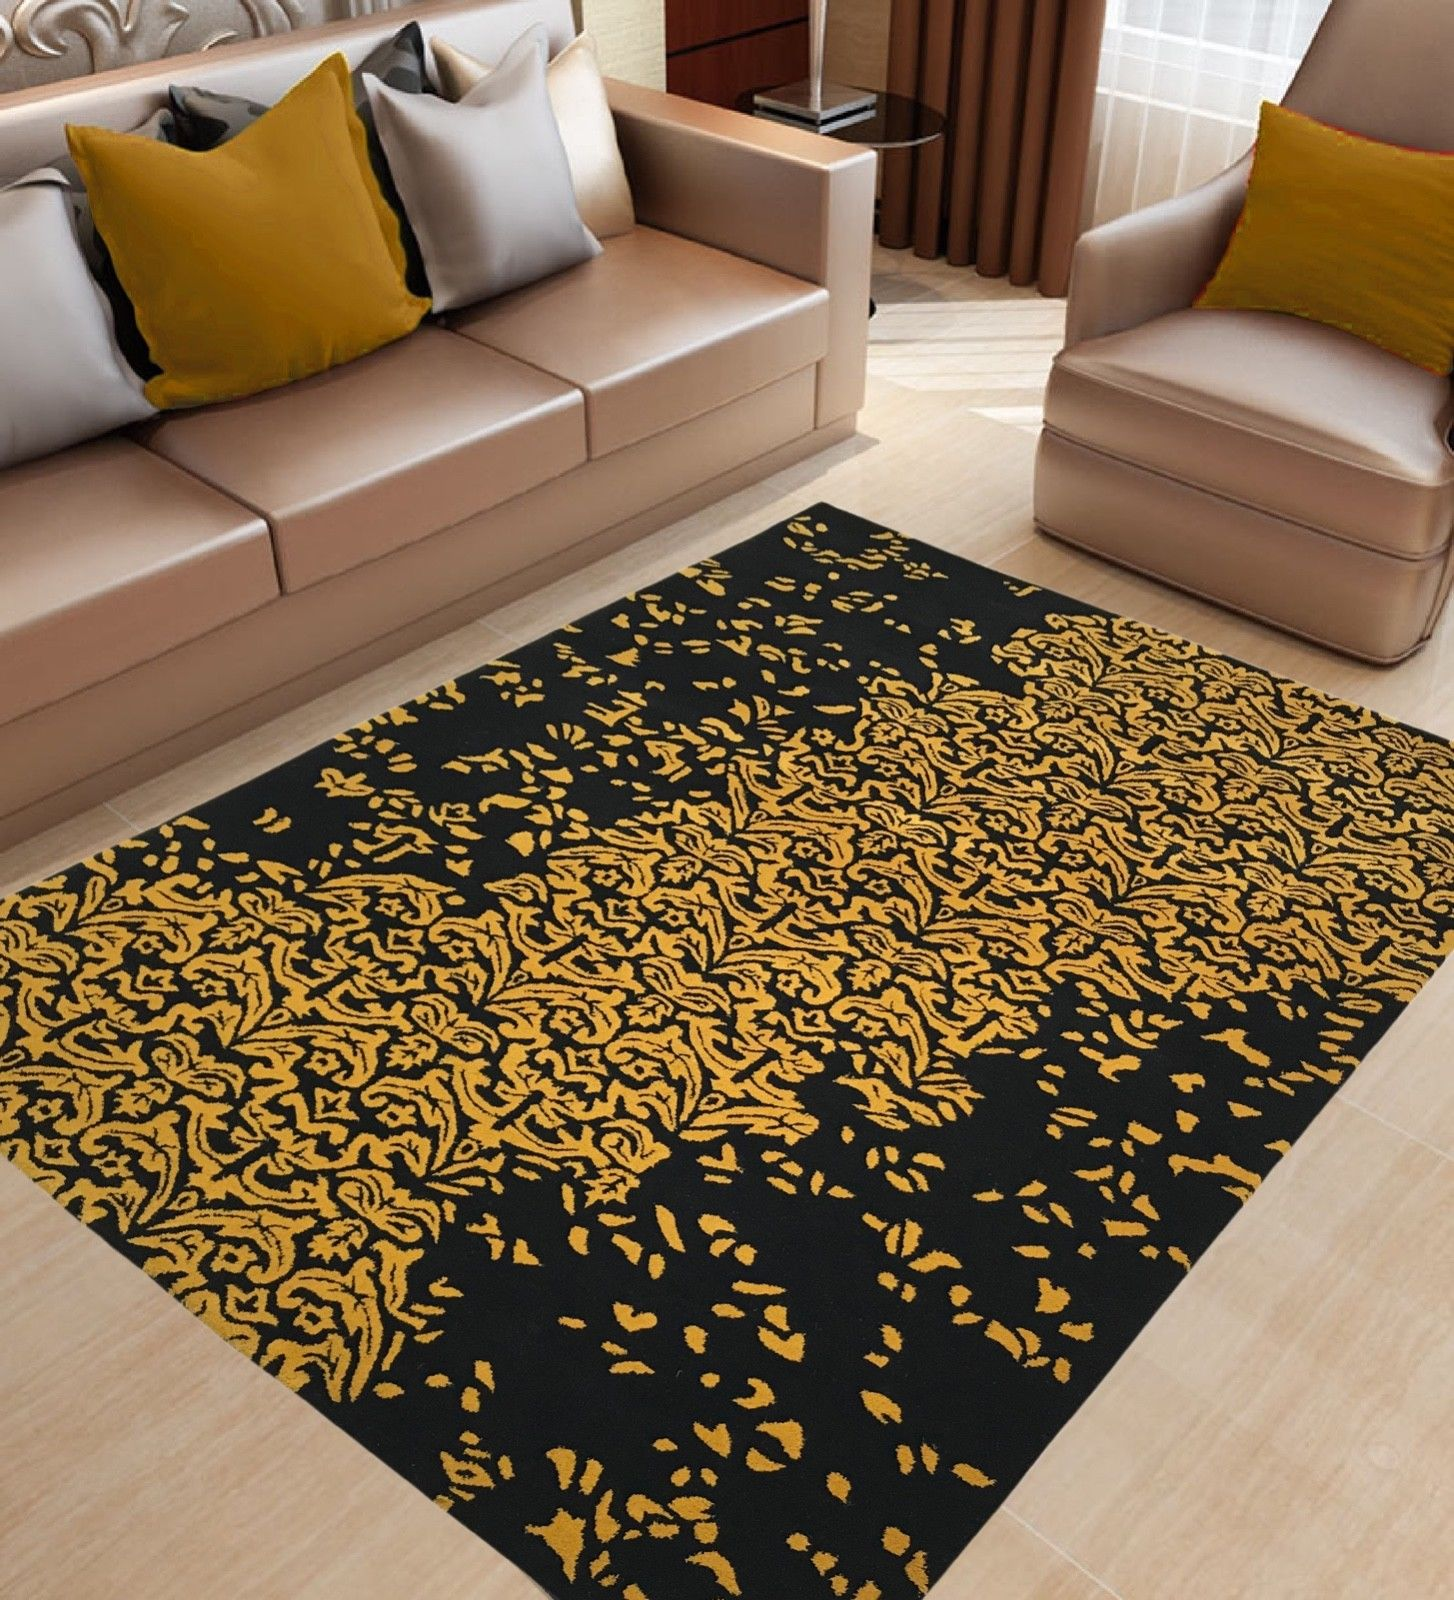 designer tapis 160x230 160x230 160x230